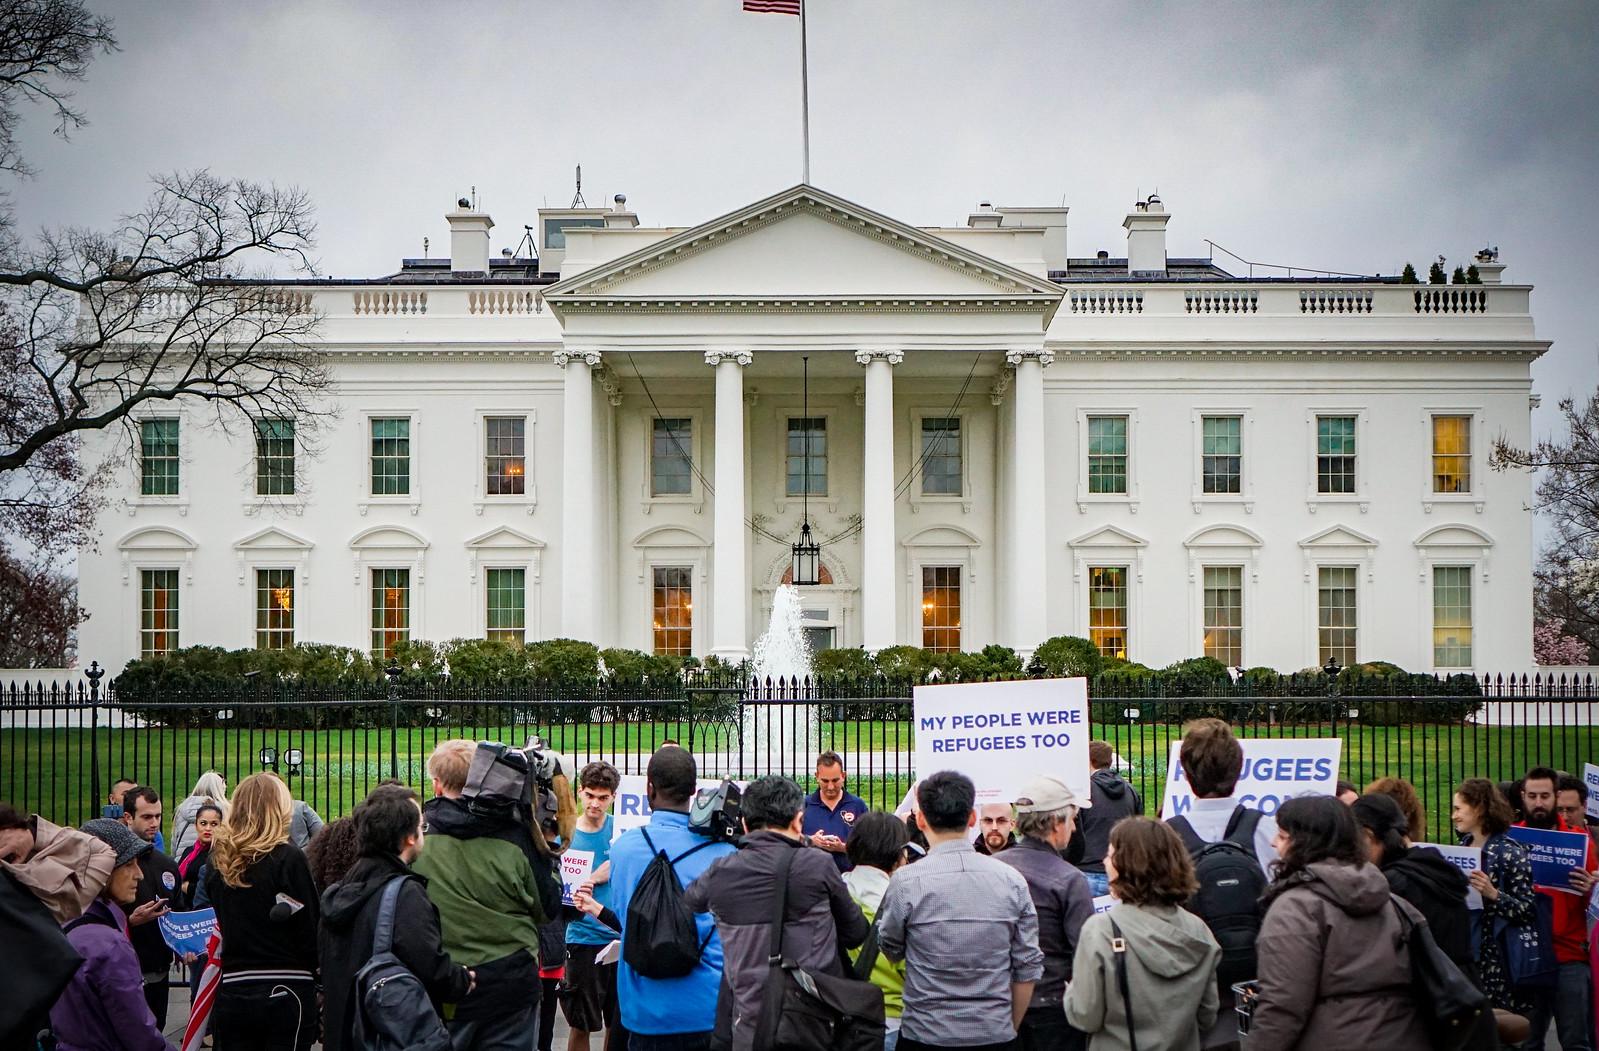 2017.03.01 #JewsForRefugees Rally, Washington, DC USA 01322